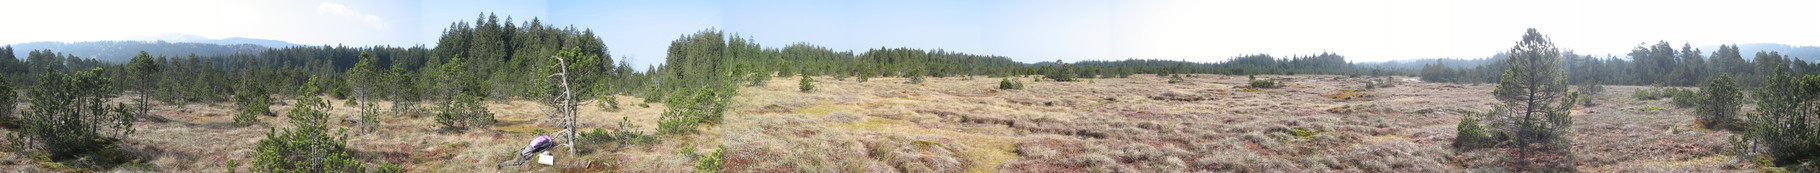 Panorama Kläperfilz